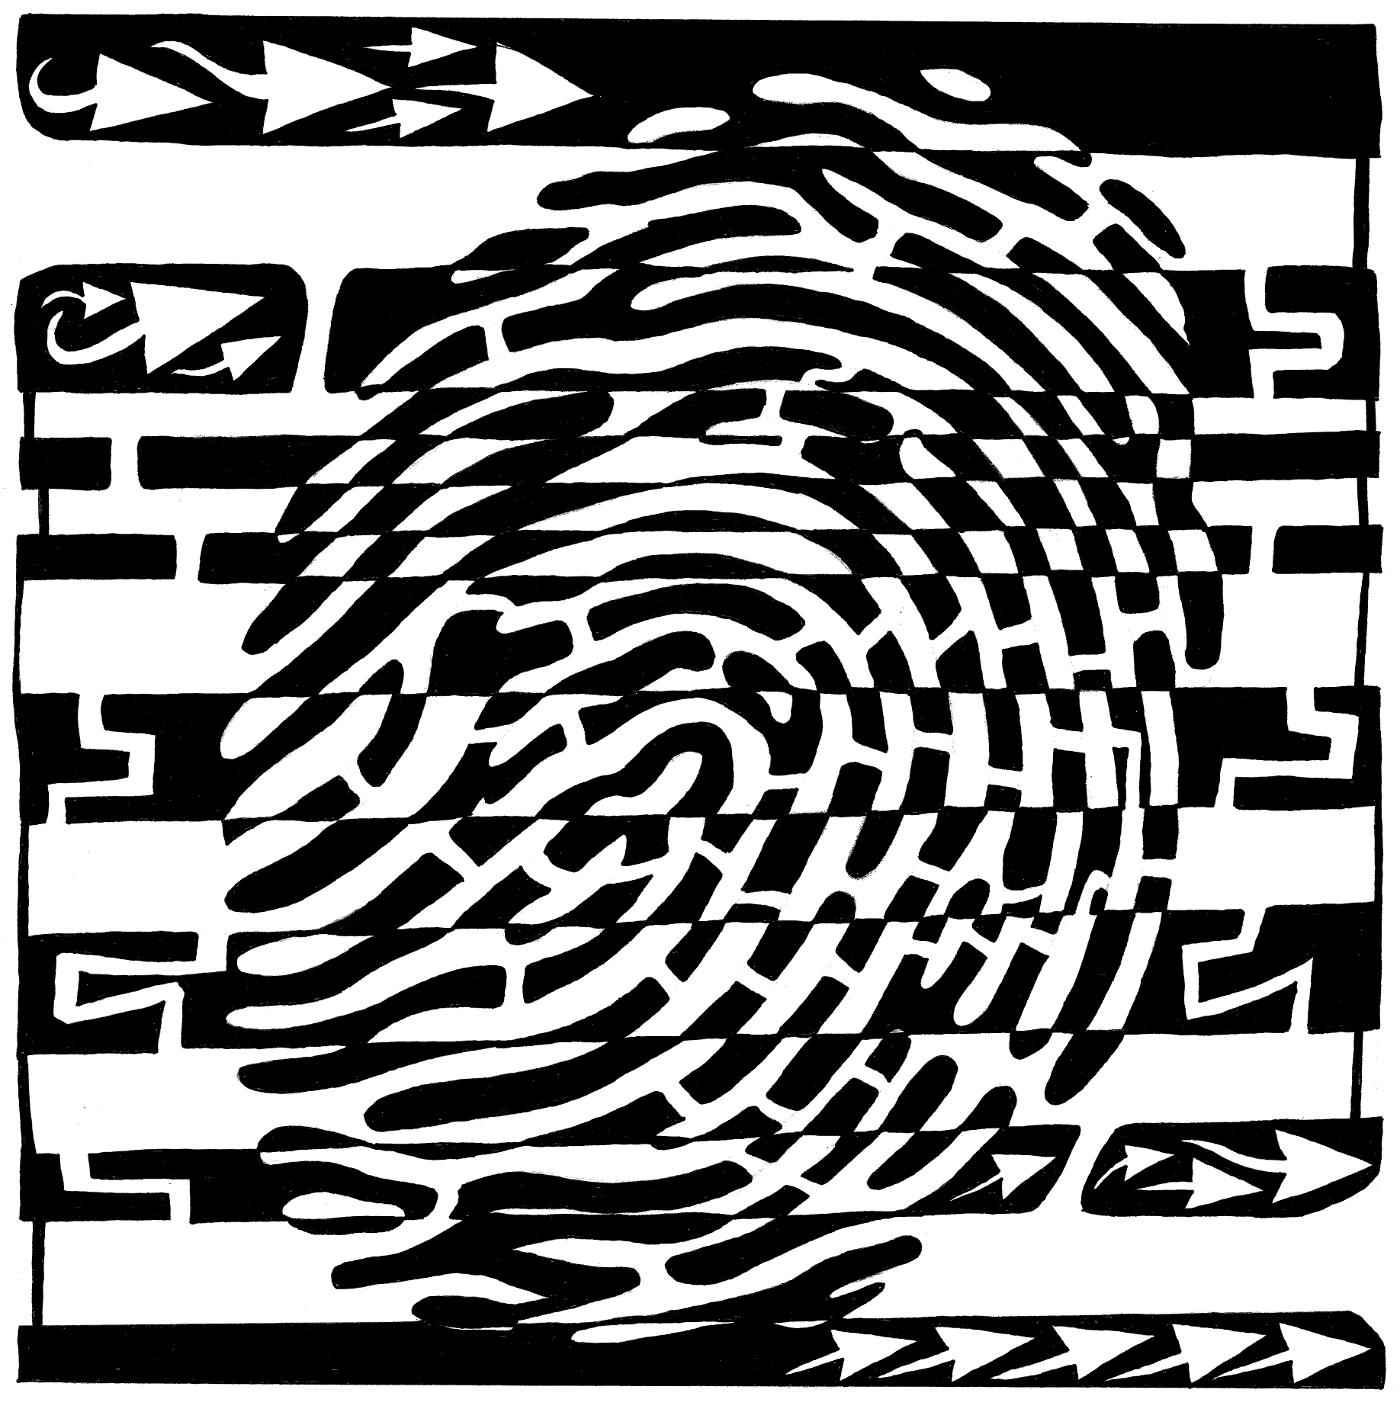 maze of fingerprint being scanned